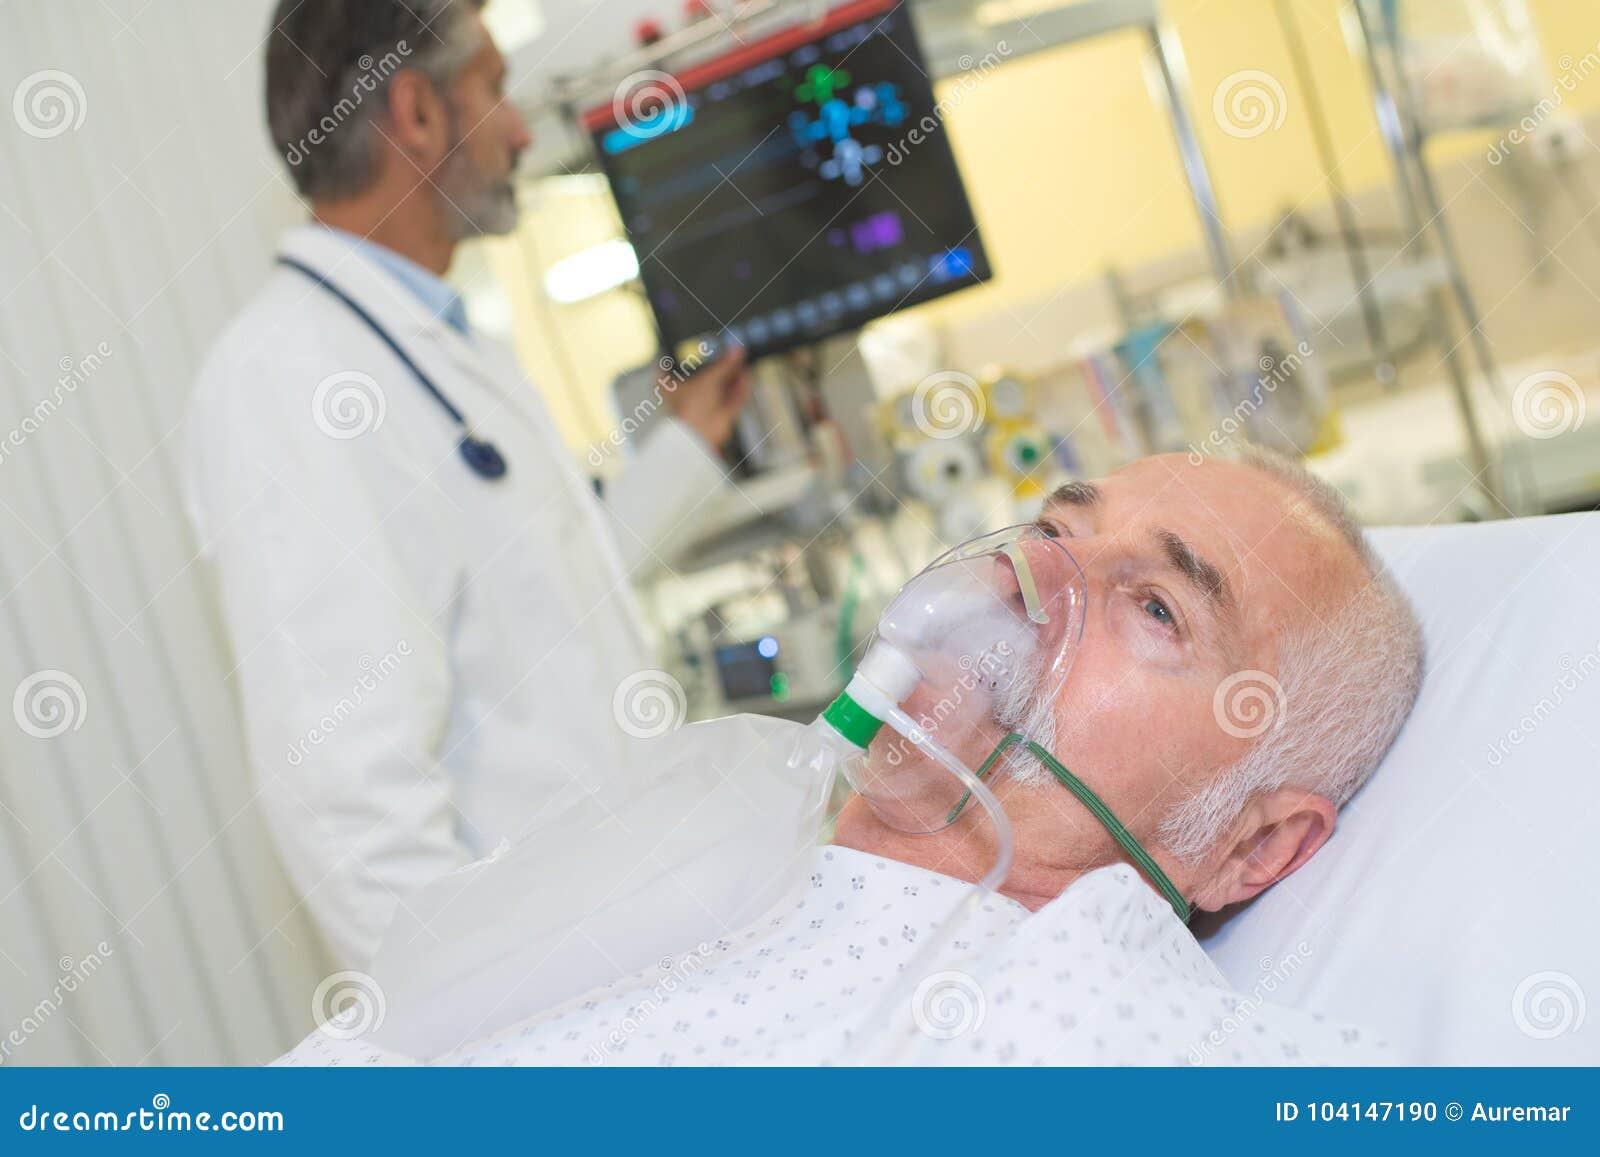 Doctor examining patient wearing oxygen mask